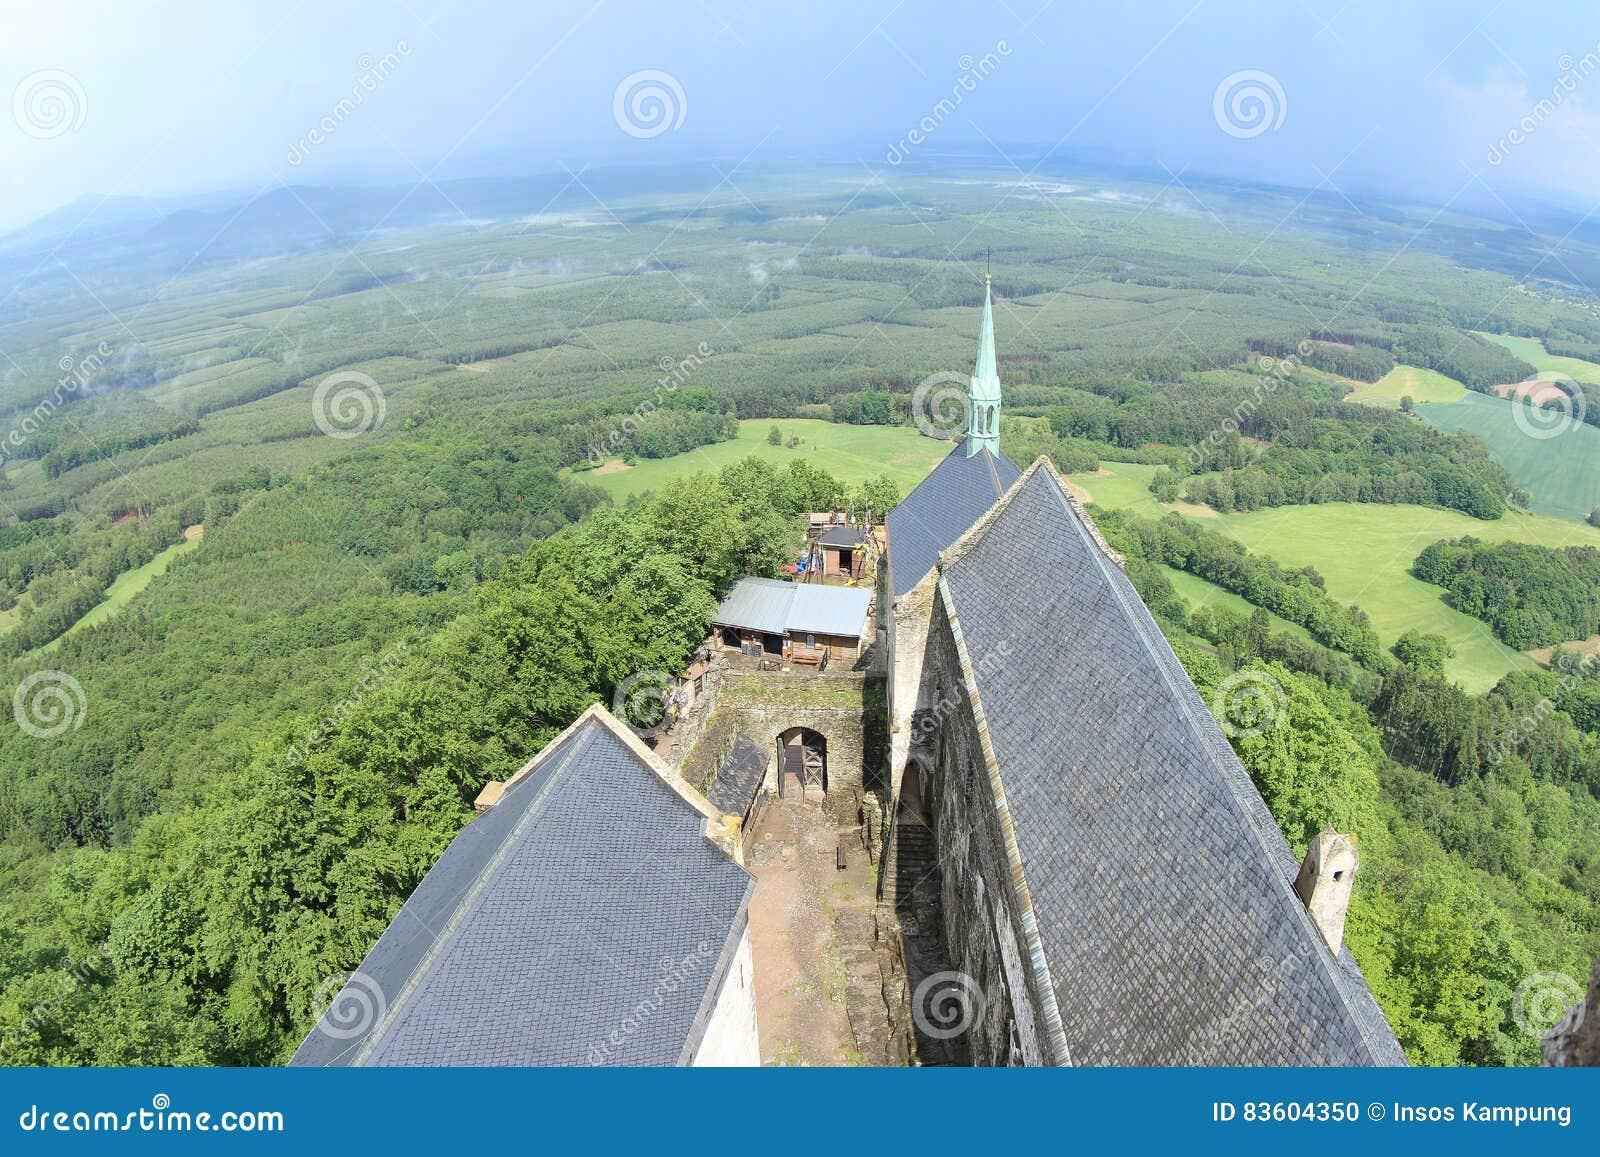 Tower View, Bezdez Castle